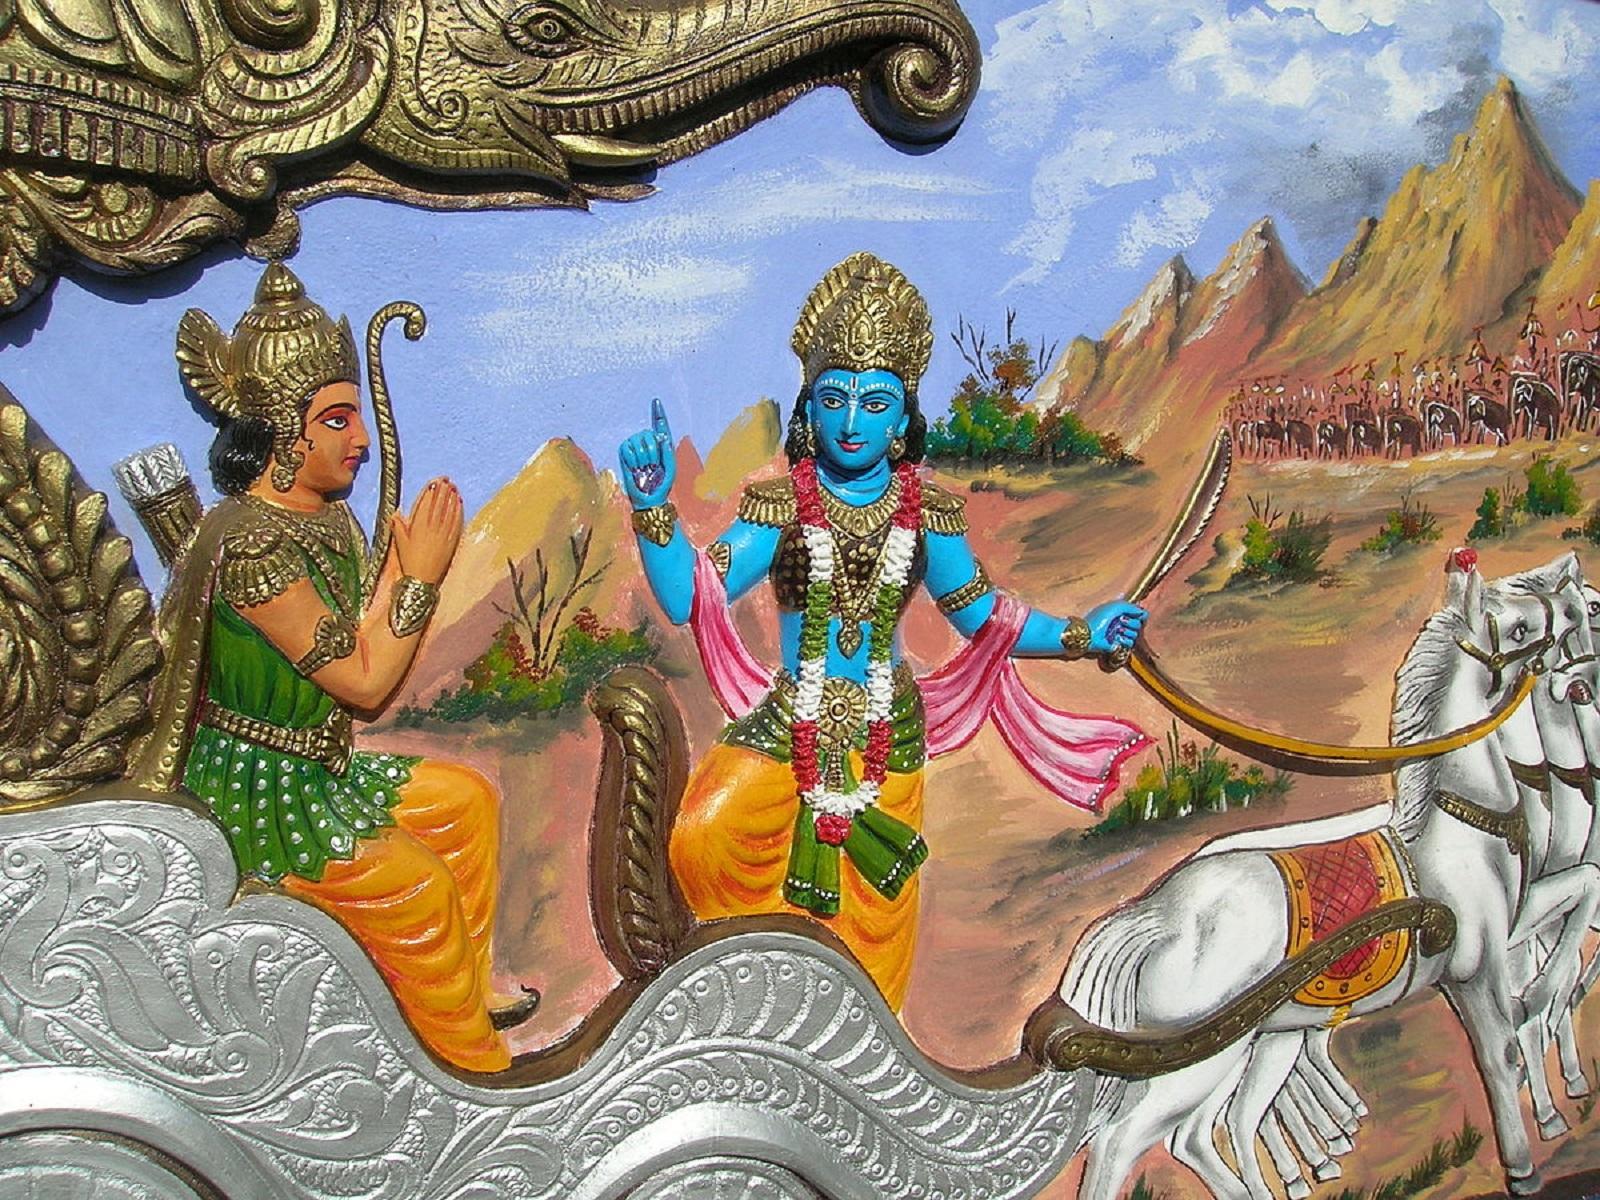 Gita jayanti mahotsav, Sree Madh Bhagwat geeta jayanti, gita jayanti 2019 kurukshetra date, geeta jayanti mahotsav 2019 kurukshetra, gita jayanti 2019 date, gita jayanti mahotsav 2019 venue, Cm manohar lal inauguration, Kurukshetra geeta jayanti Mohatsav, Celebration of geeta jayanti in Kurukshetra